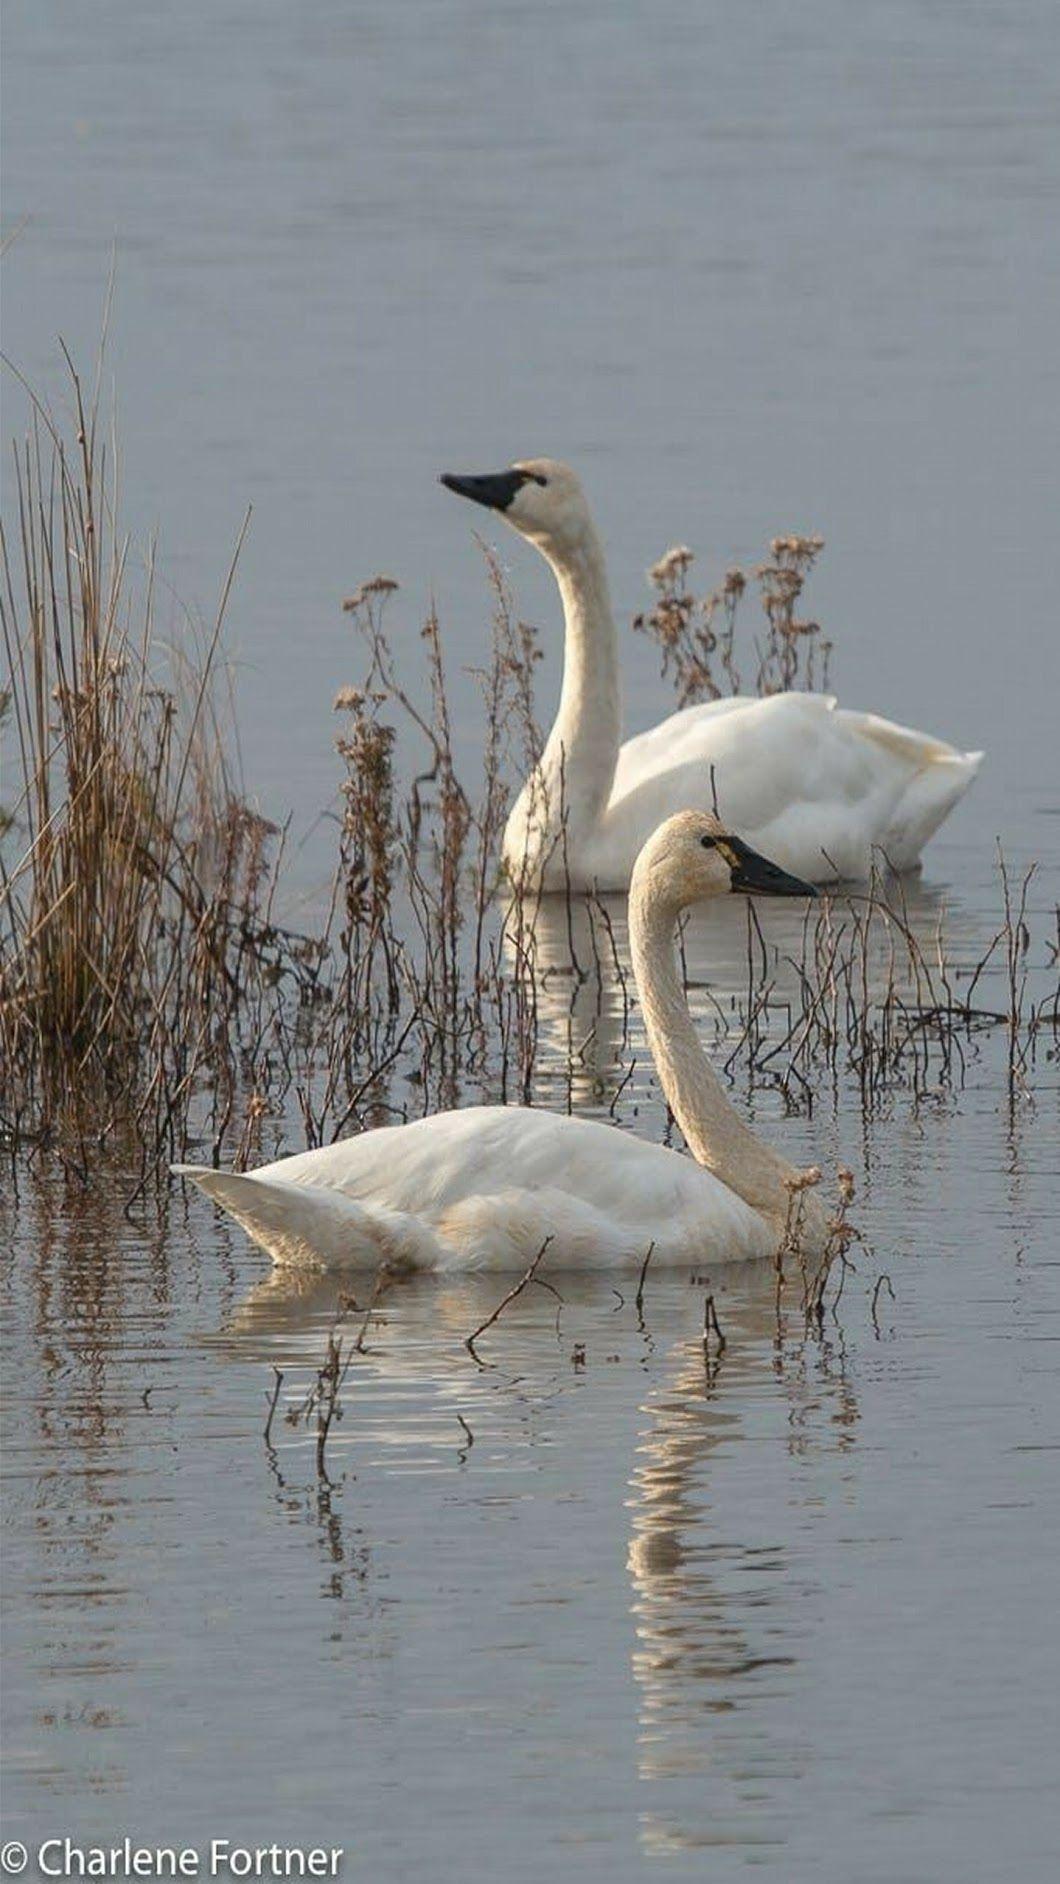 Photo SO SERENE!! 🐦 Beautiful birds, Bird life list